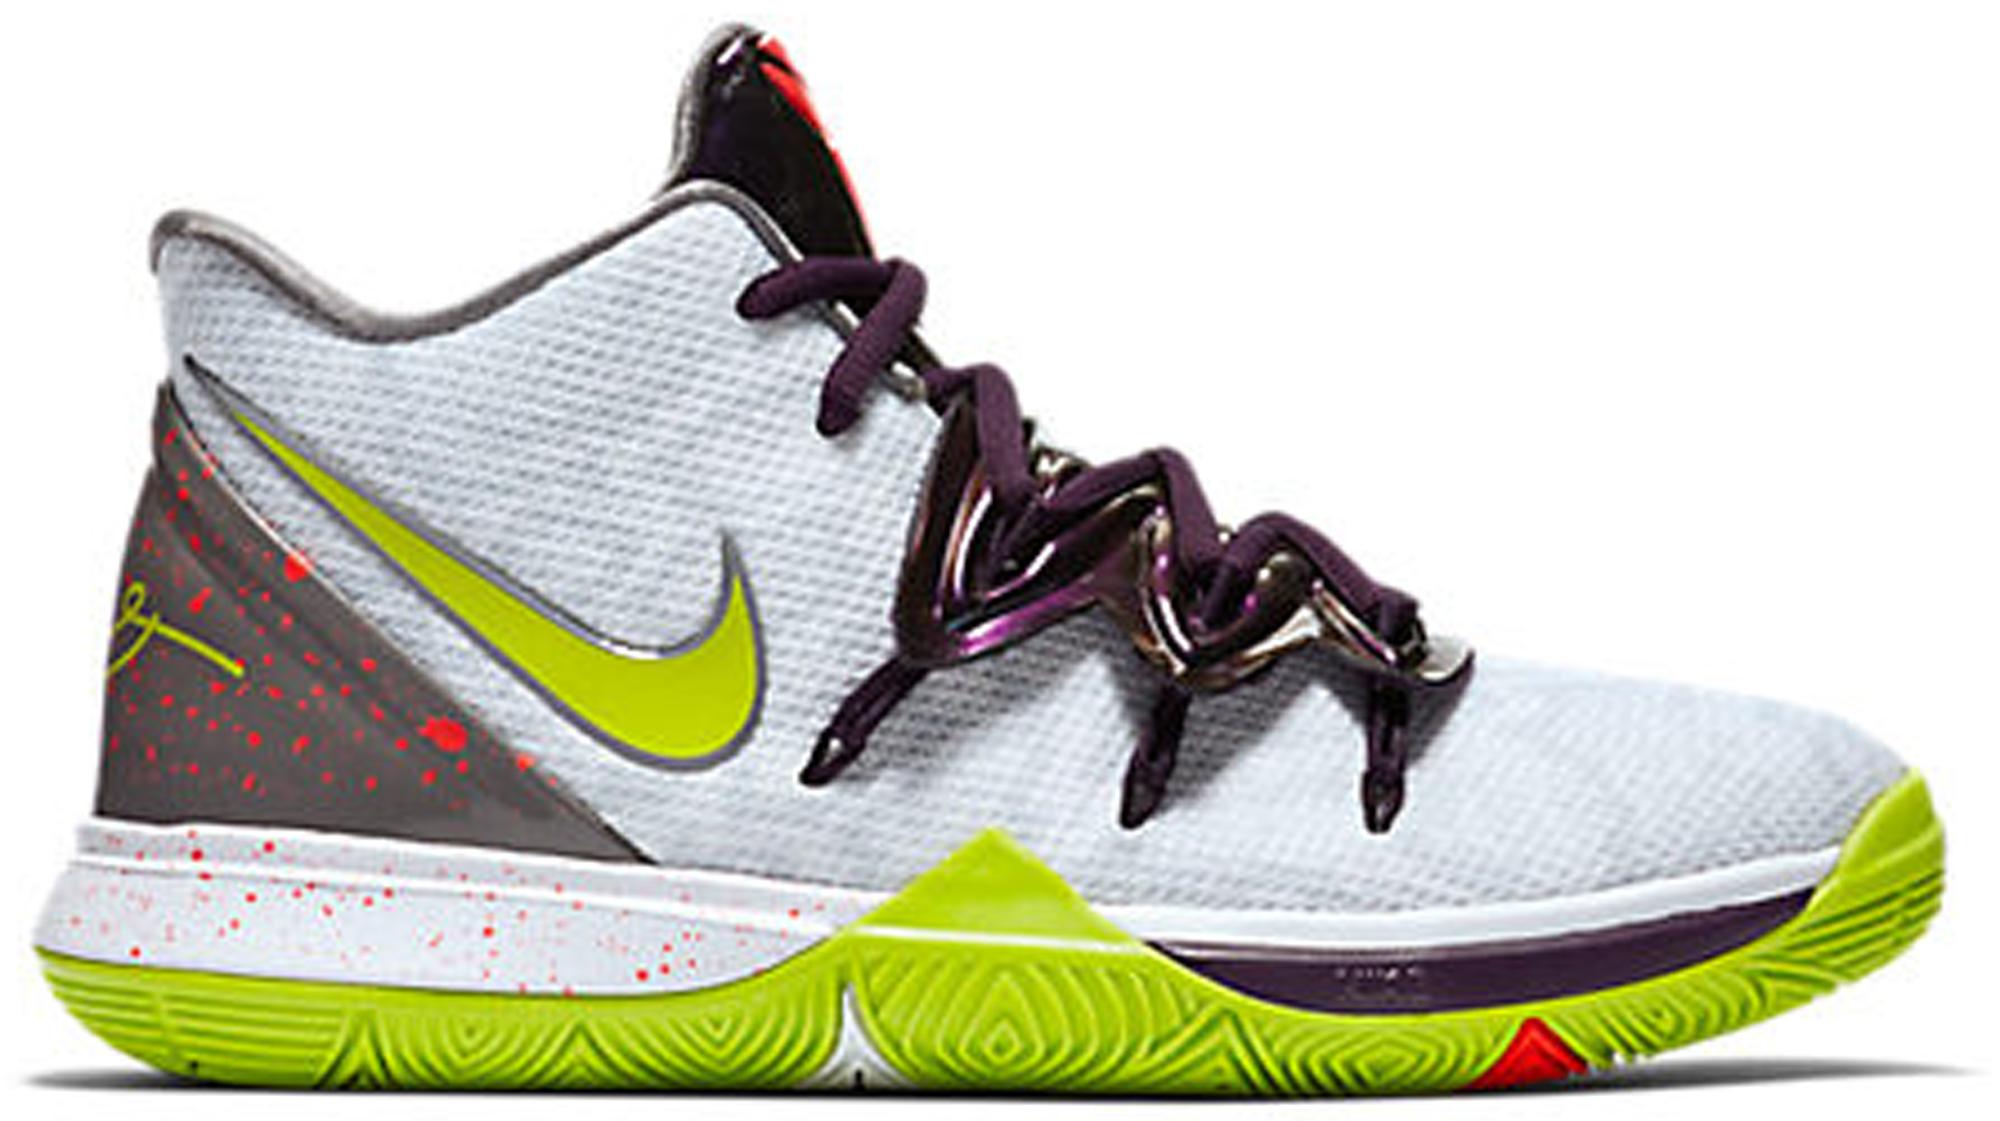 Nike Kyrie 5 Mamba Mentality (GS